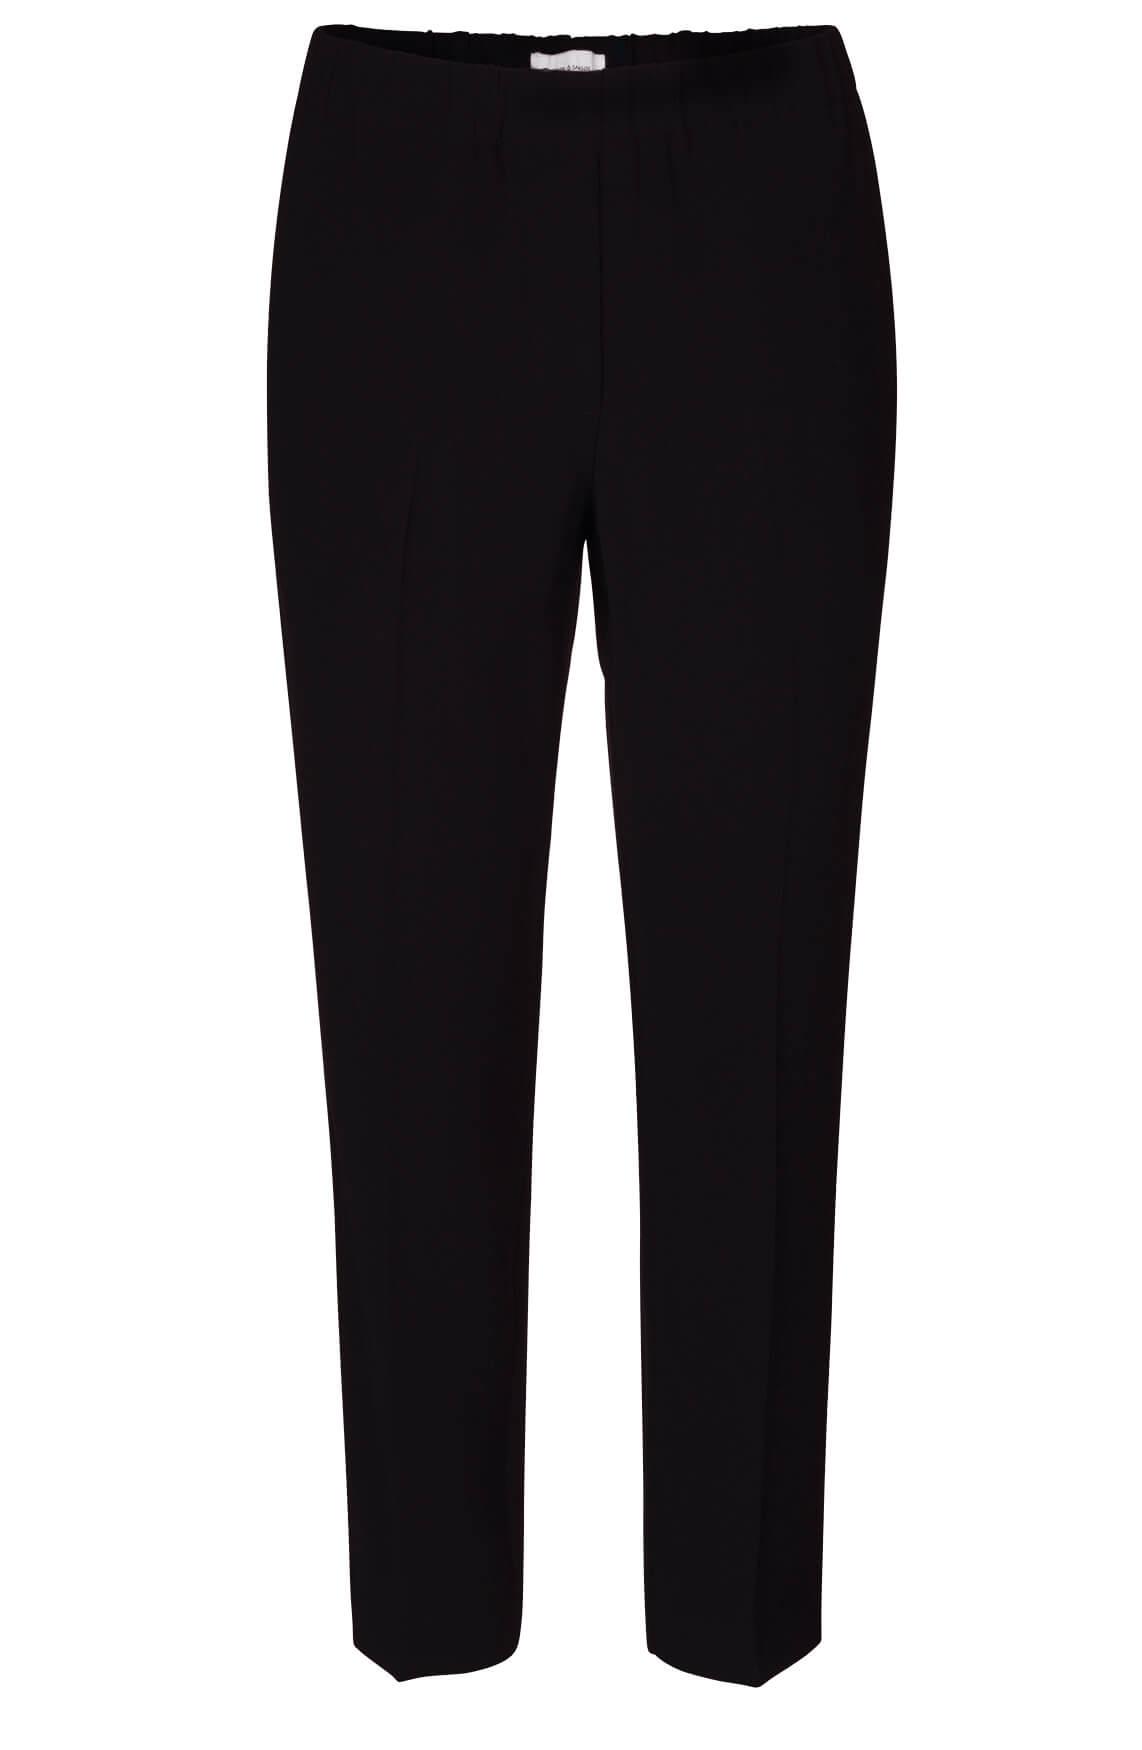 Samsoe Samsoe Dames Hoys comfortabele broek zwart